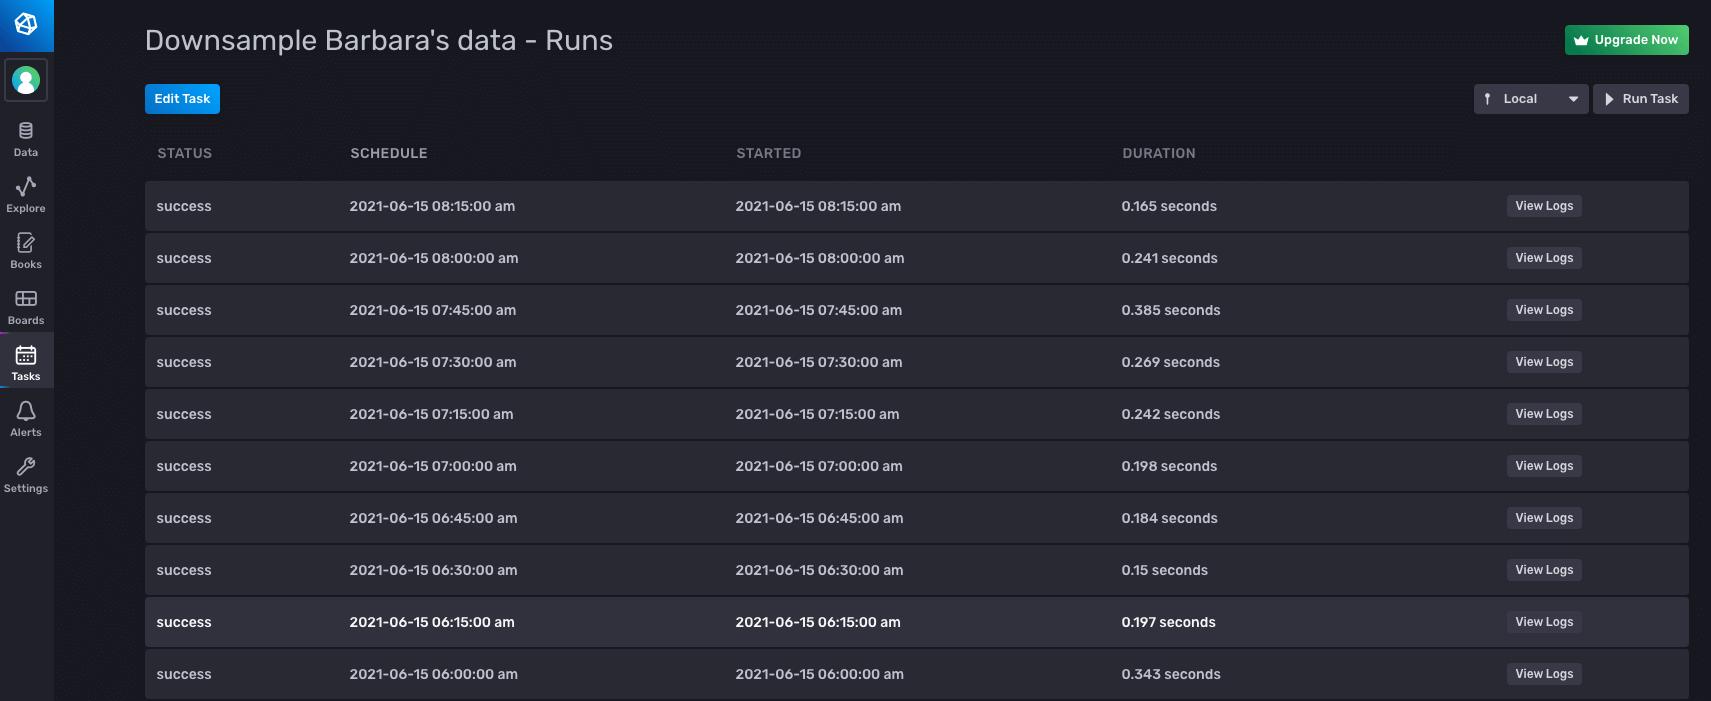 Downsample Barbaras data - runs